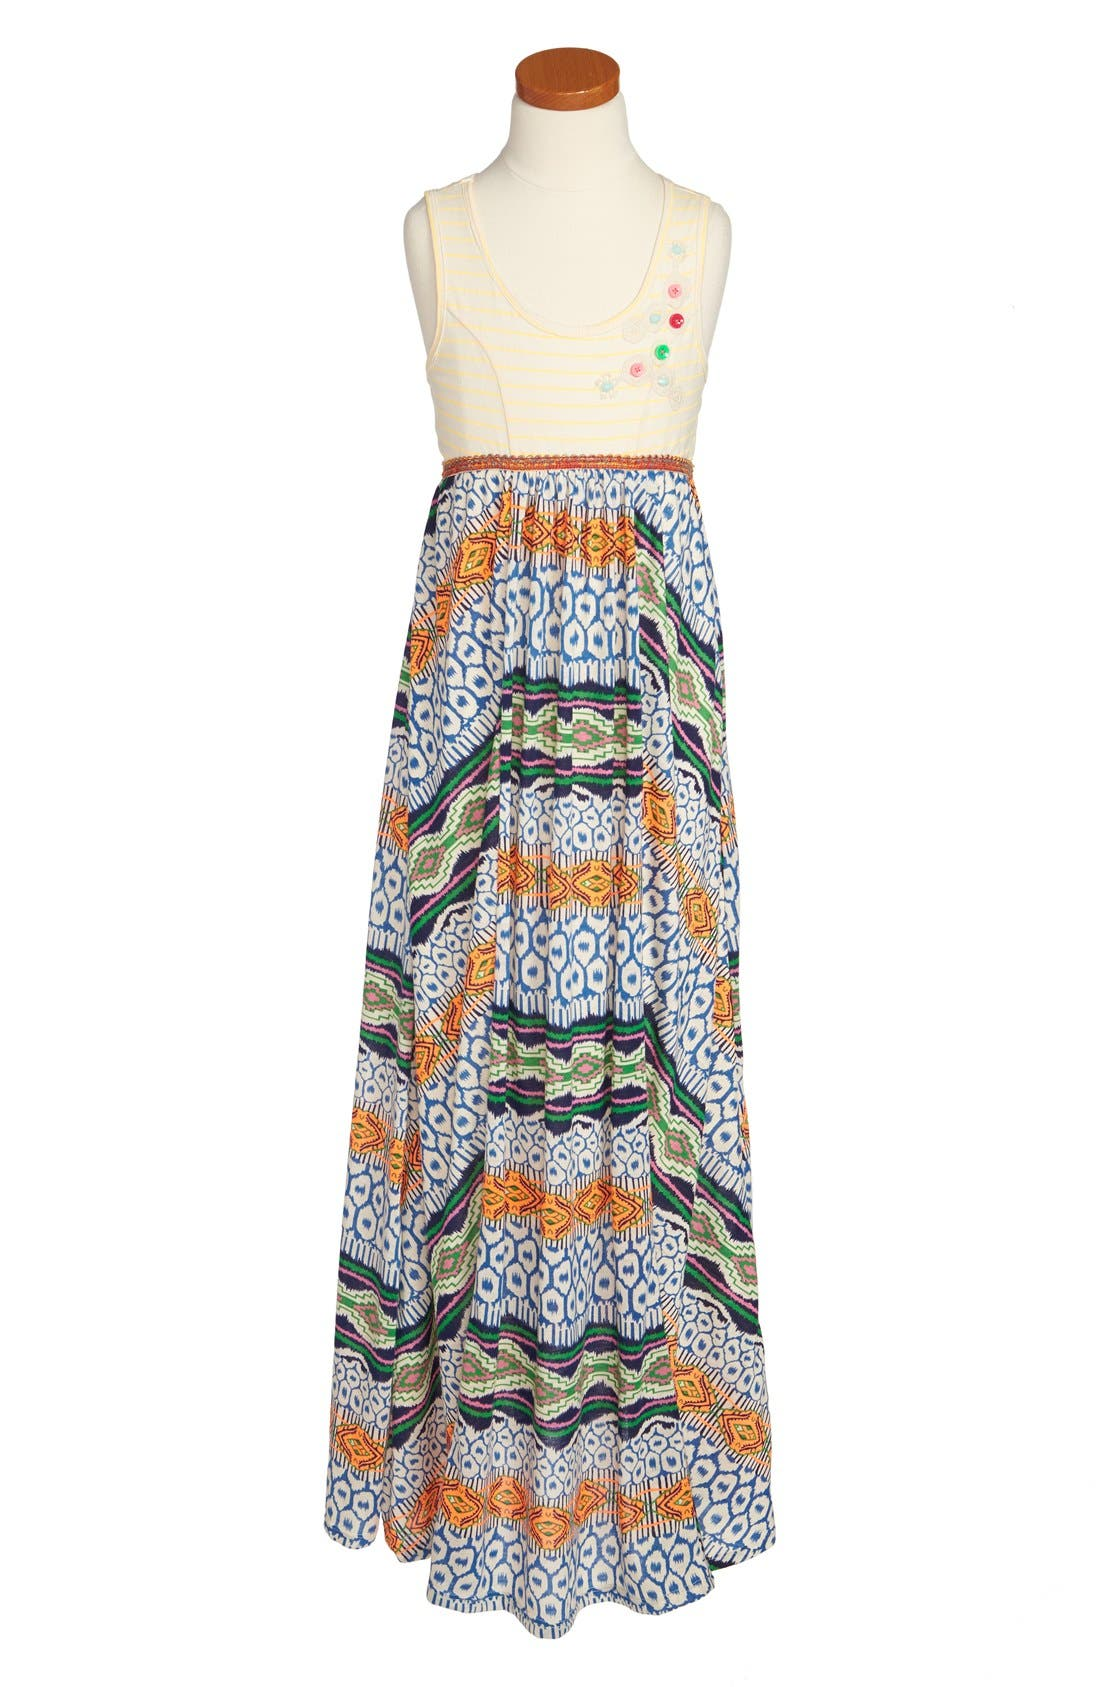 Alternate Image 1 Selected - Truly Me Mixed Media Maxi Dress (Big Girls)